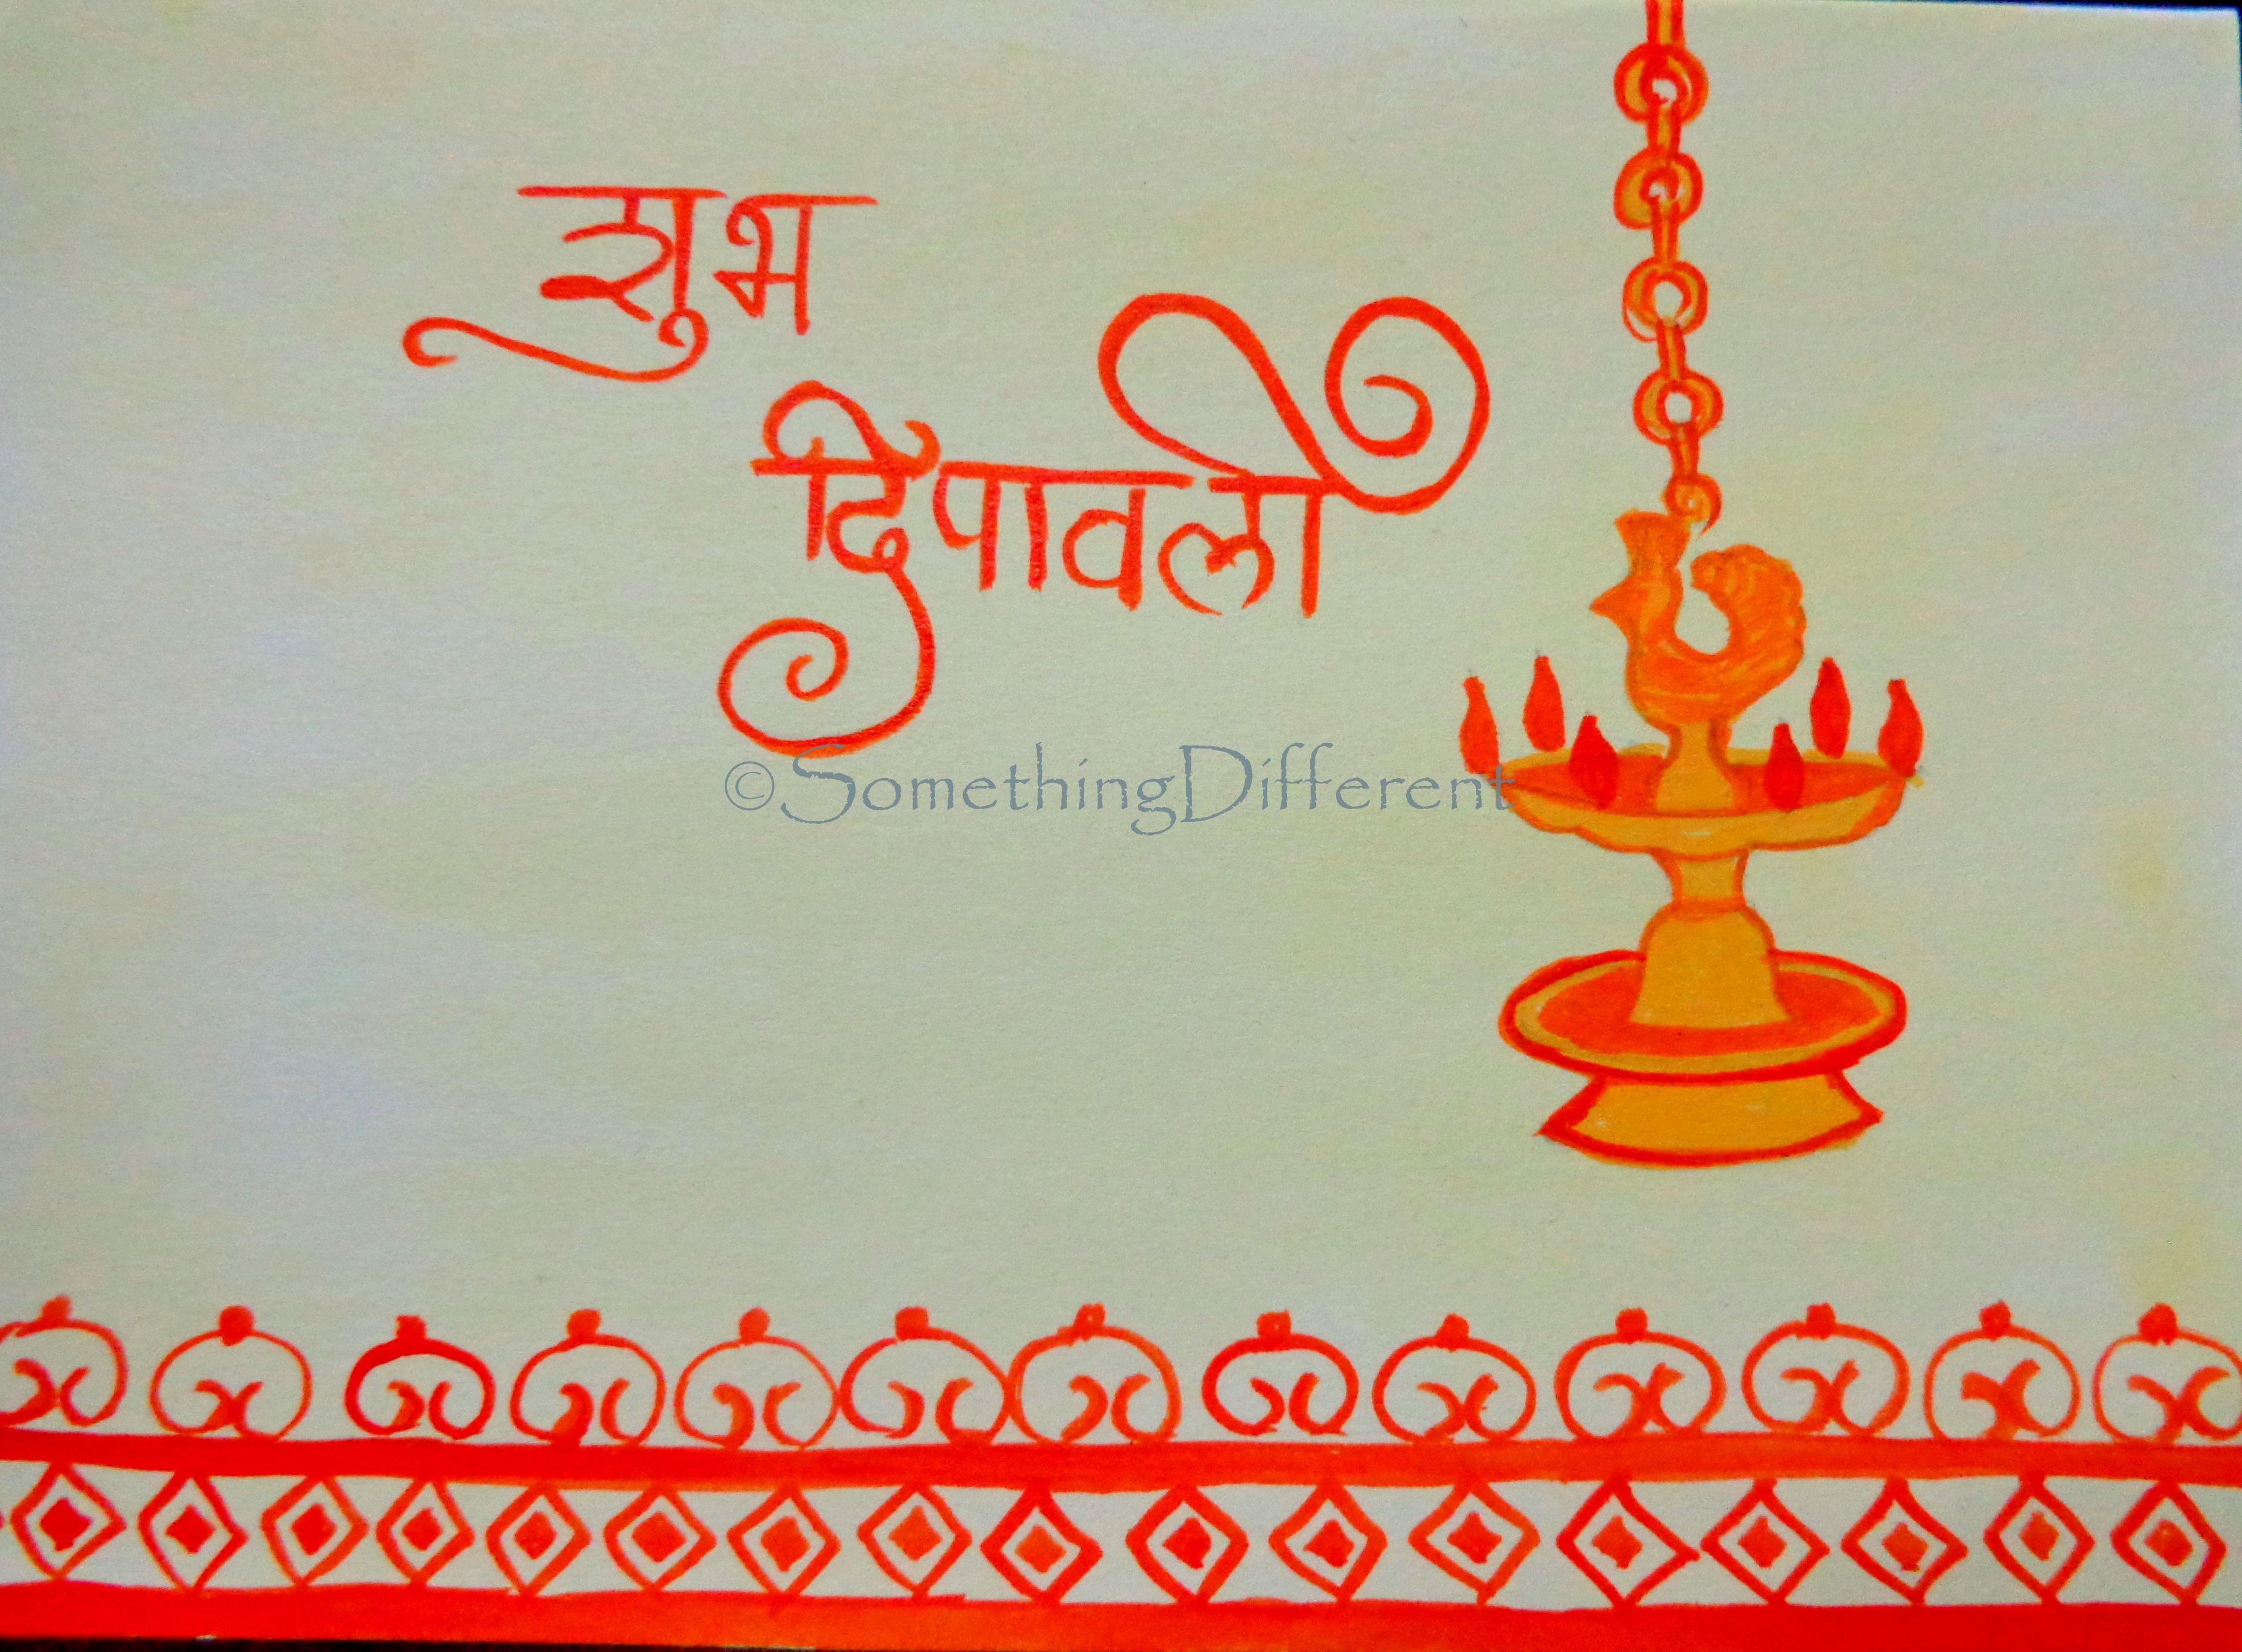 Marathi diwali card dipawali shubheccha greeting diwali marathi diwali card dipawali shubheccha greeting kristyandbryce Image collections